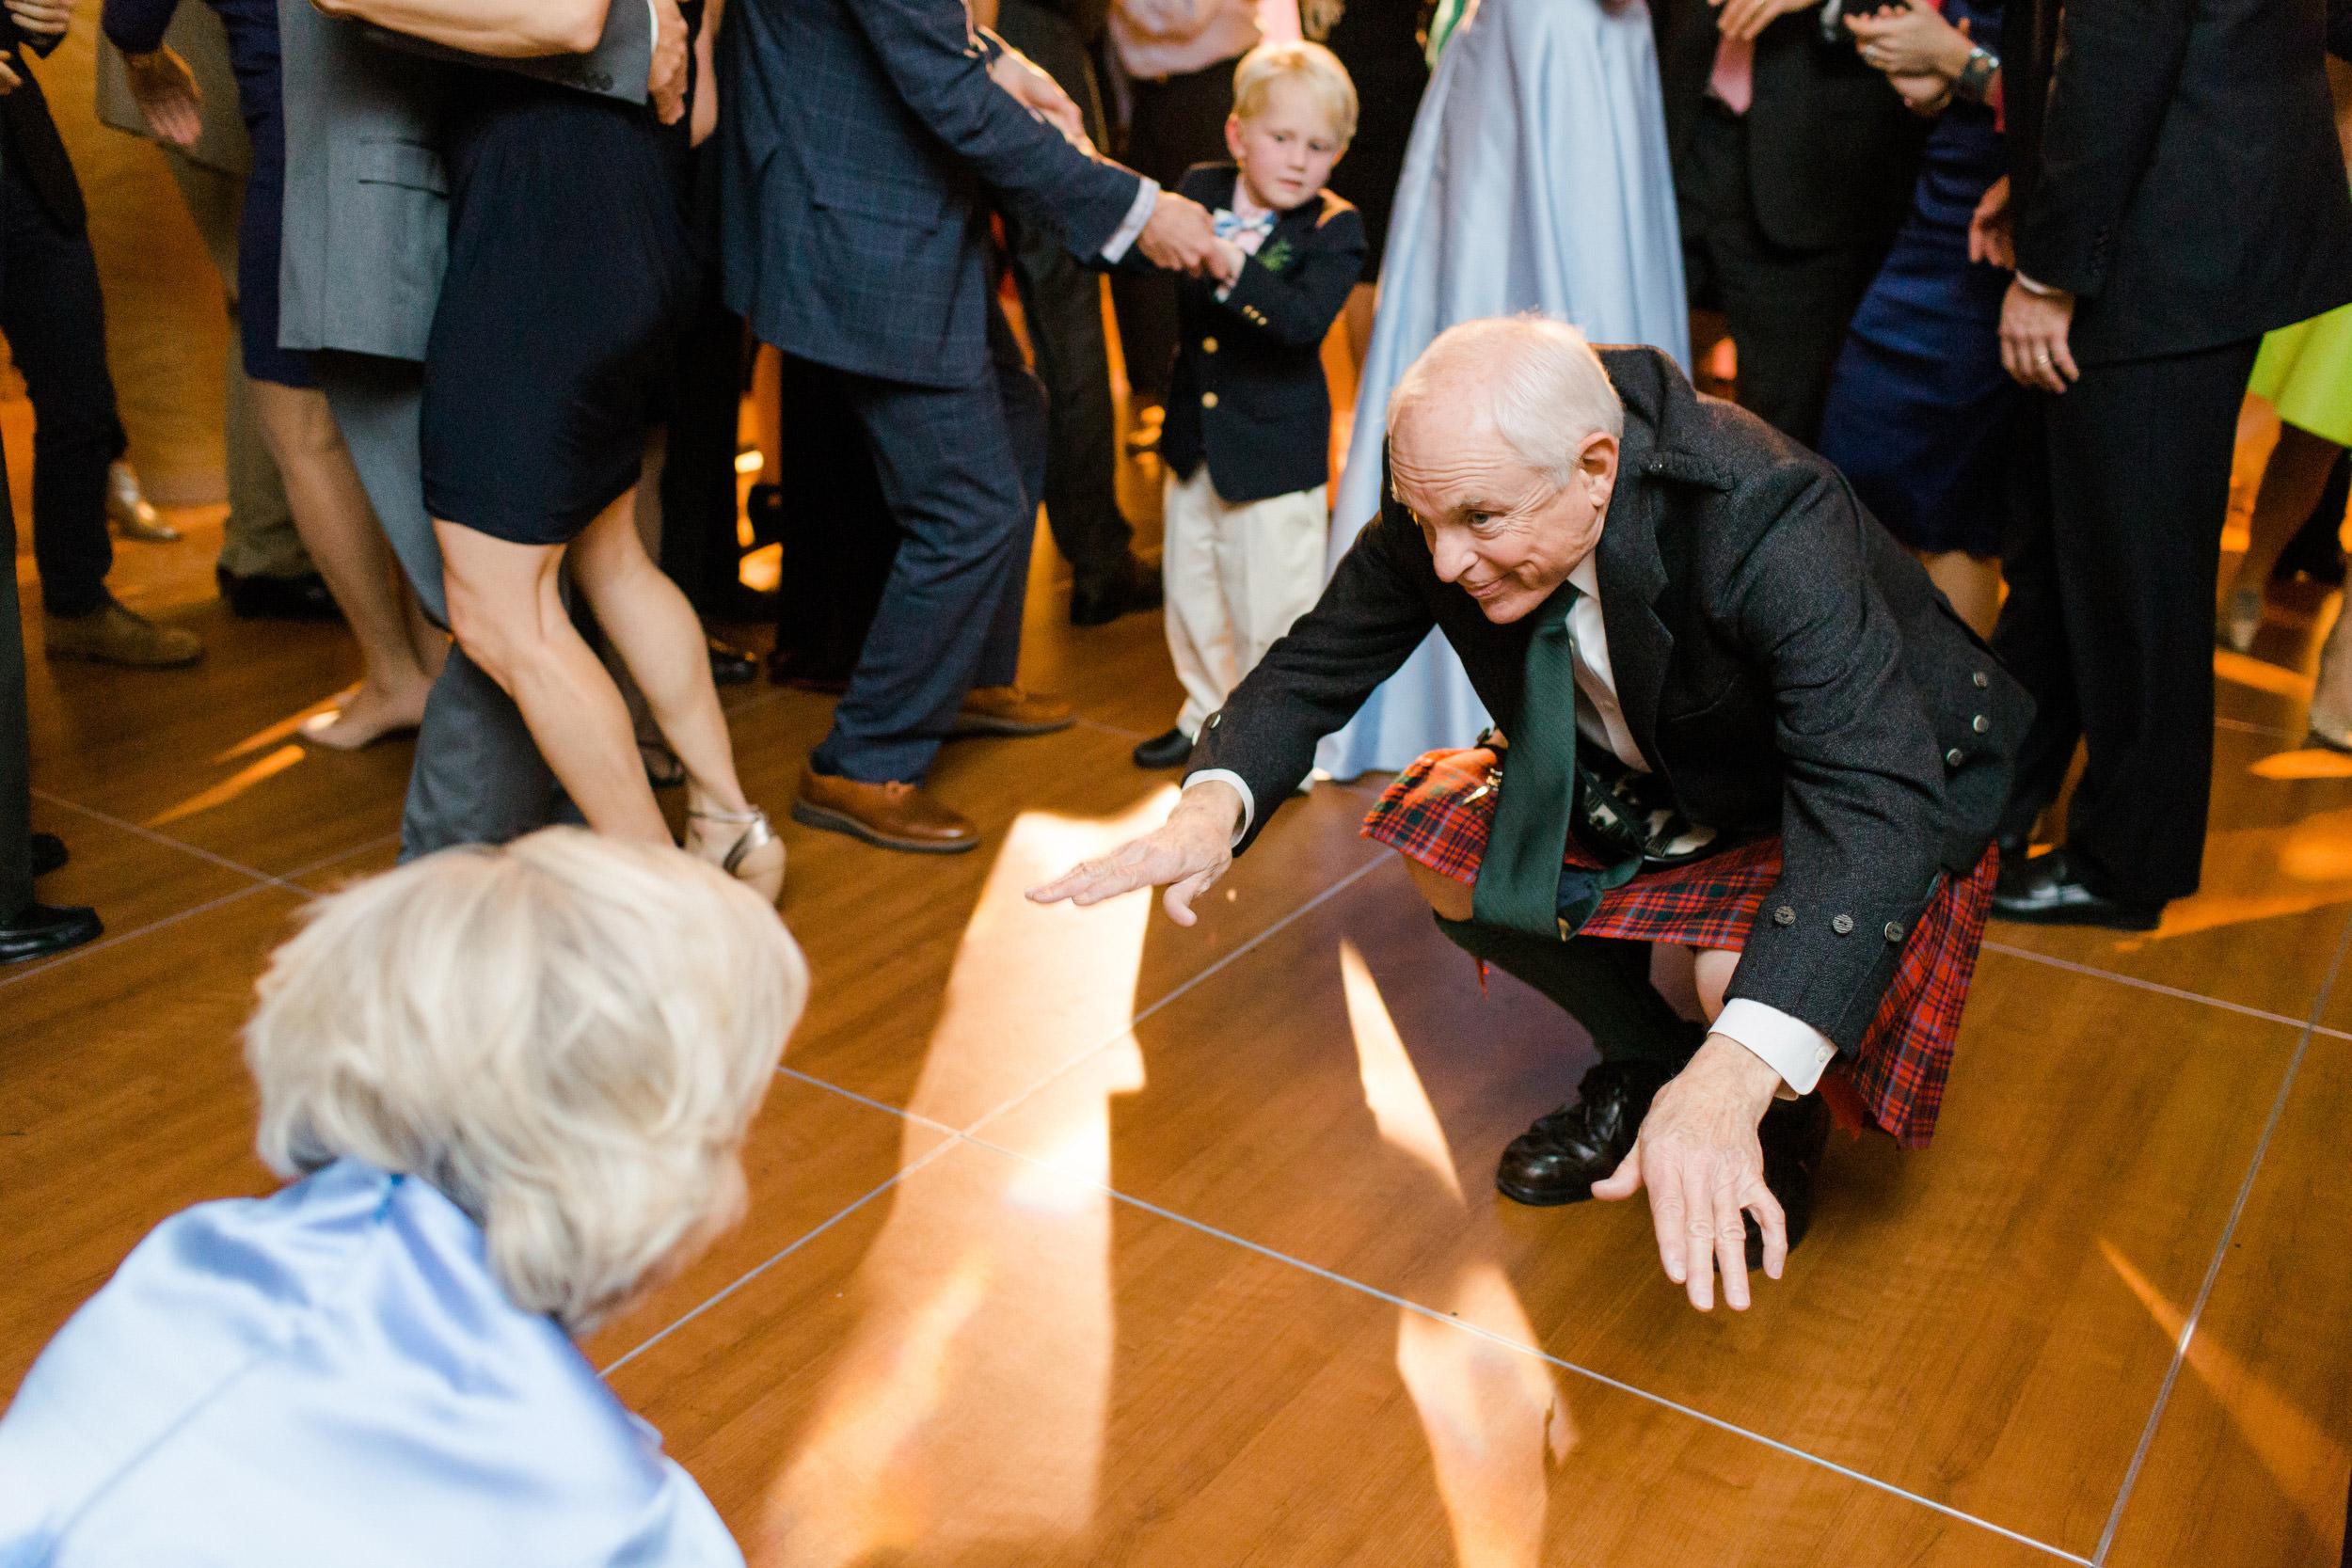 biltmore_santa_barbara_wedding_photos_coral_casino_058.jpg